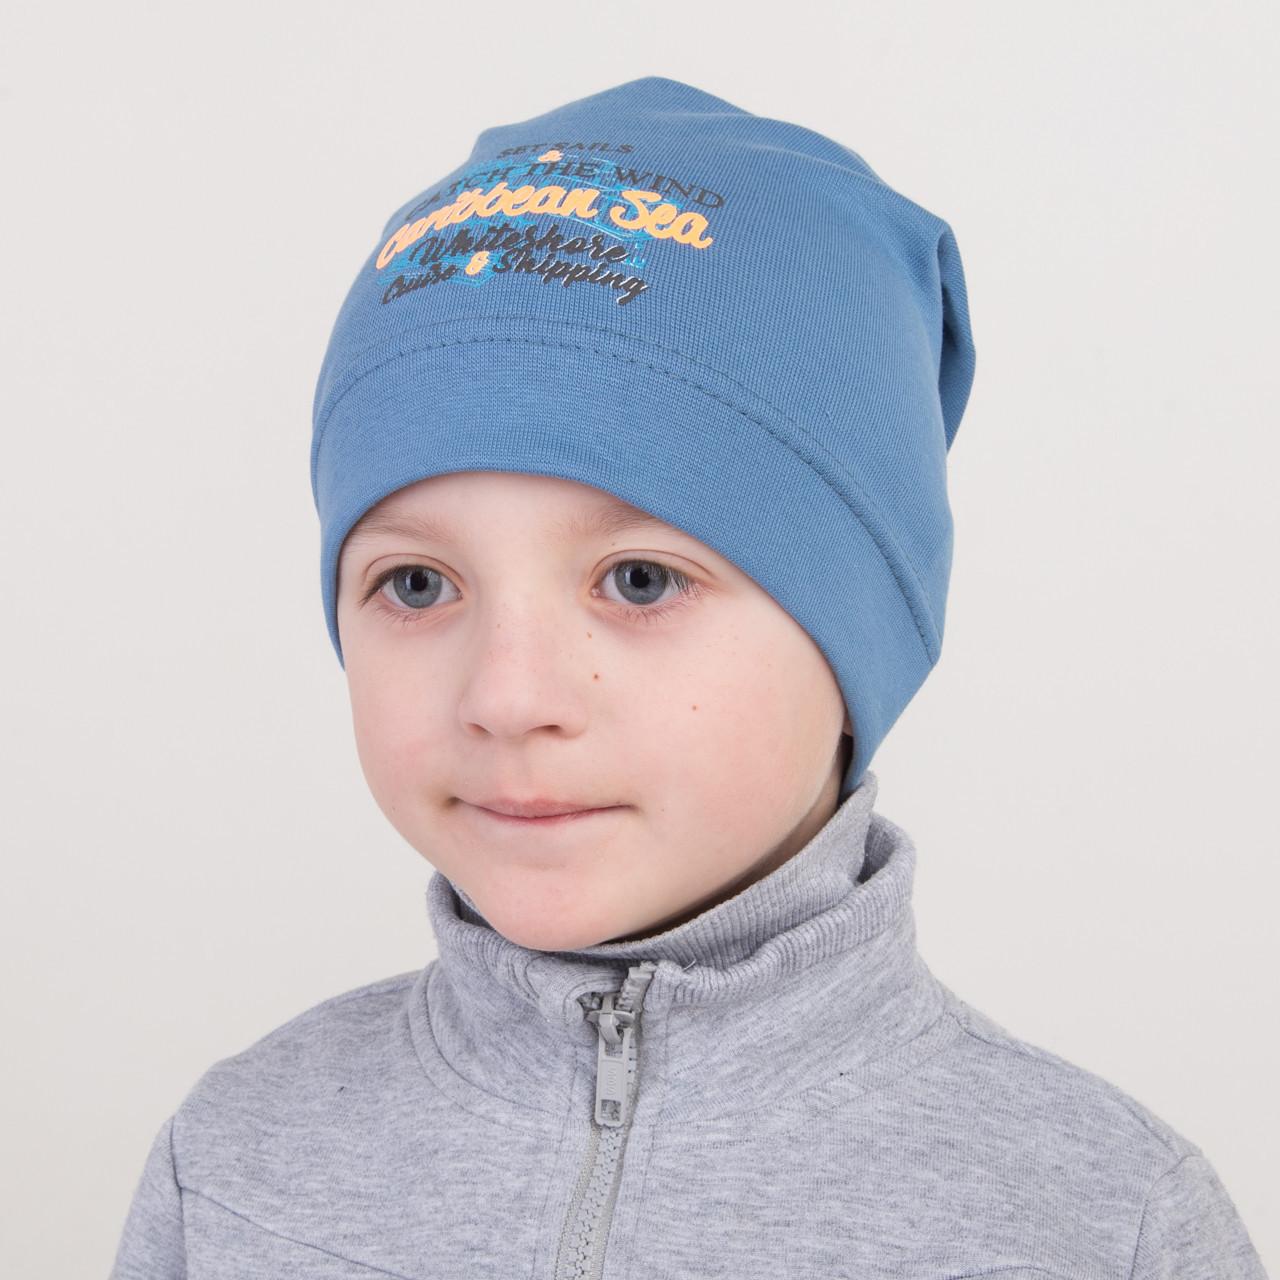 Шапка для мальчика на весну оптом - Артикул 2264